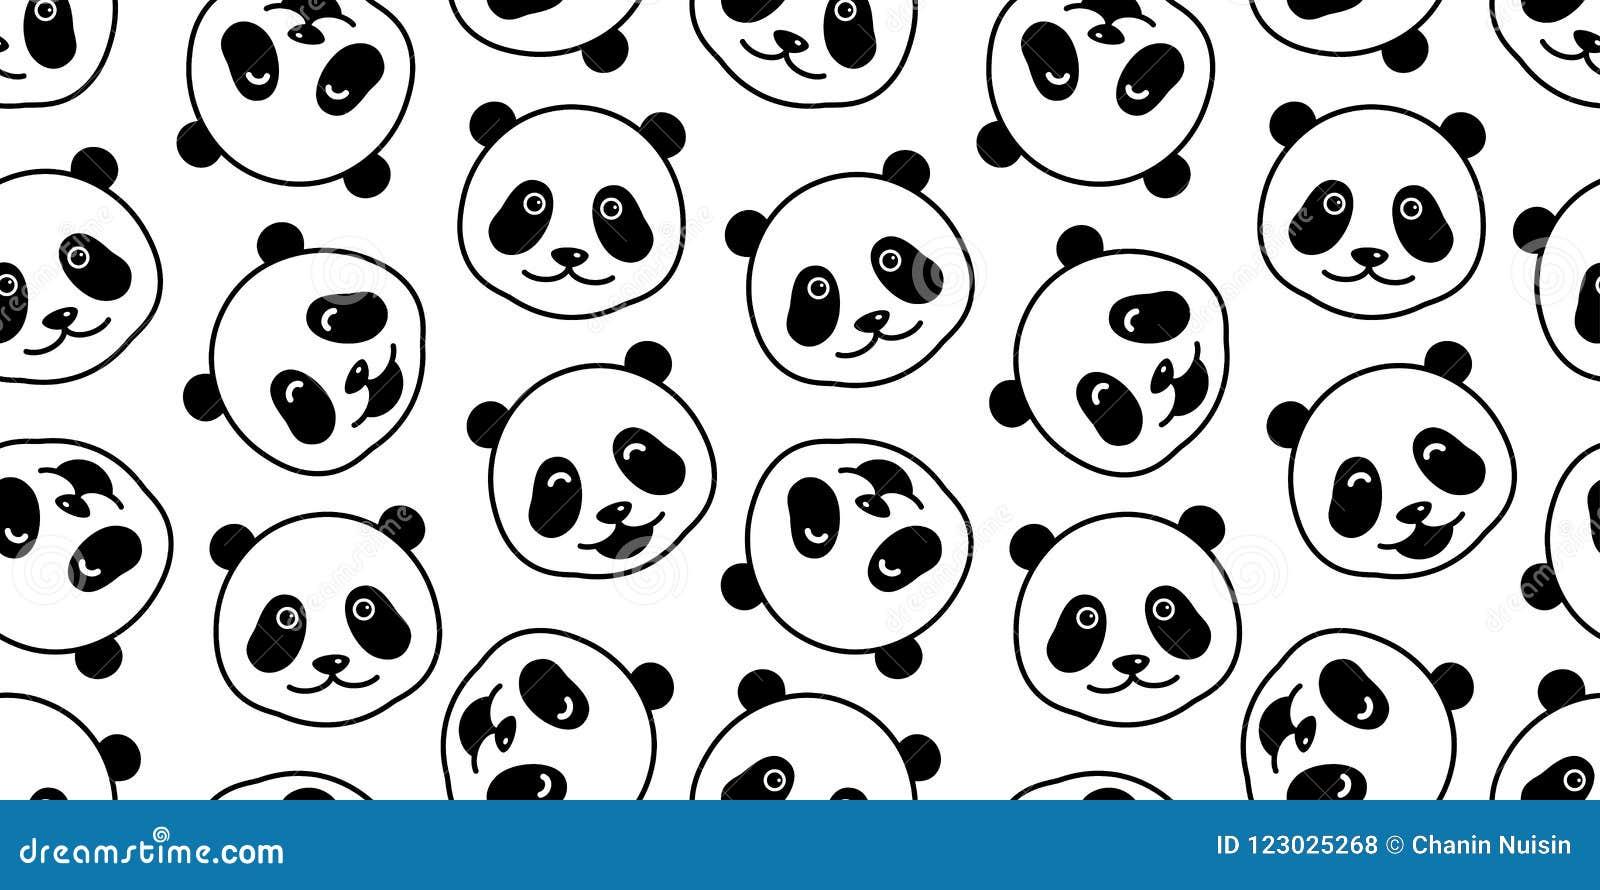 Bear Seamless Pattern Vector Panda Isolated Polar Bear Head Doodle